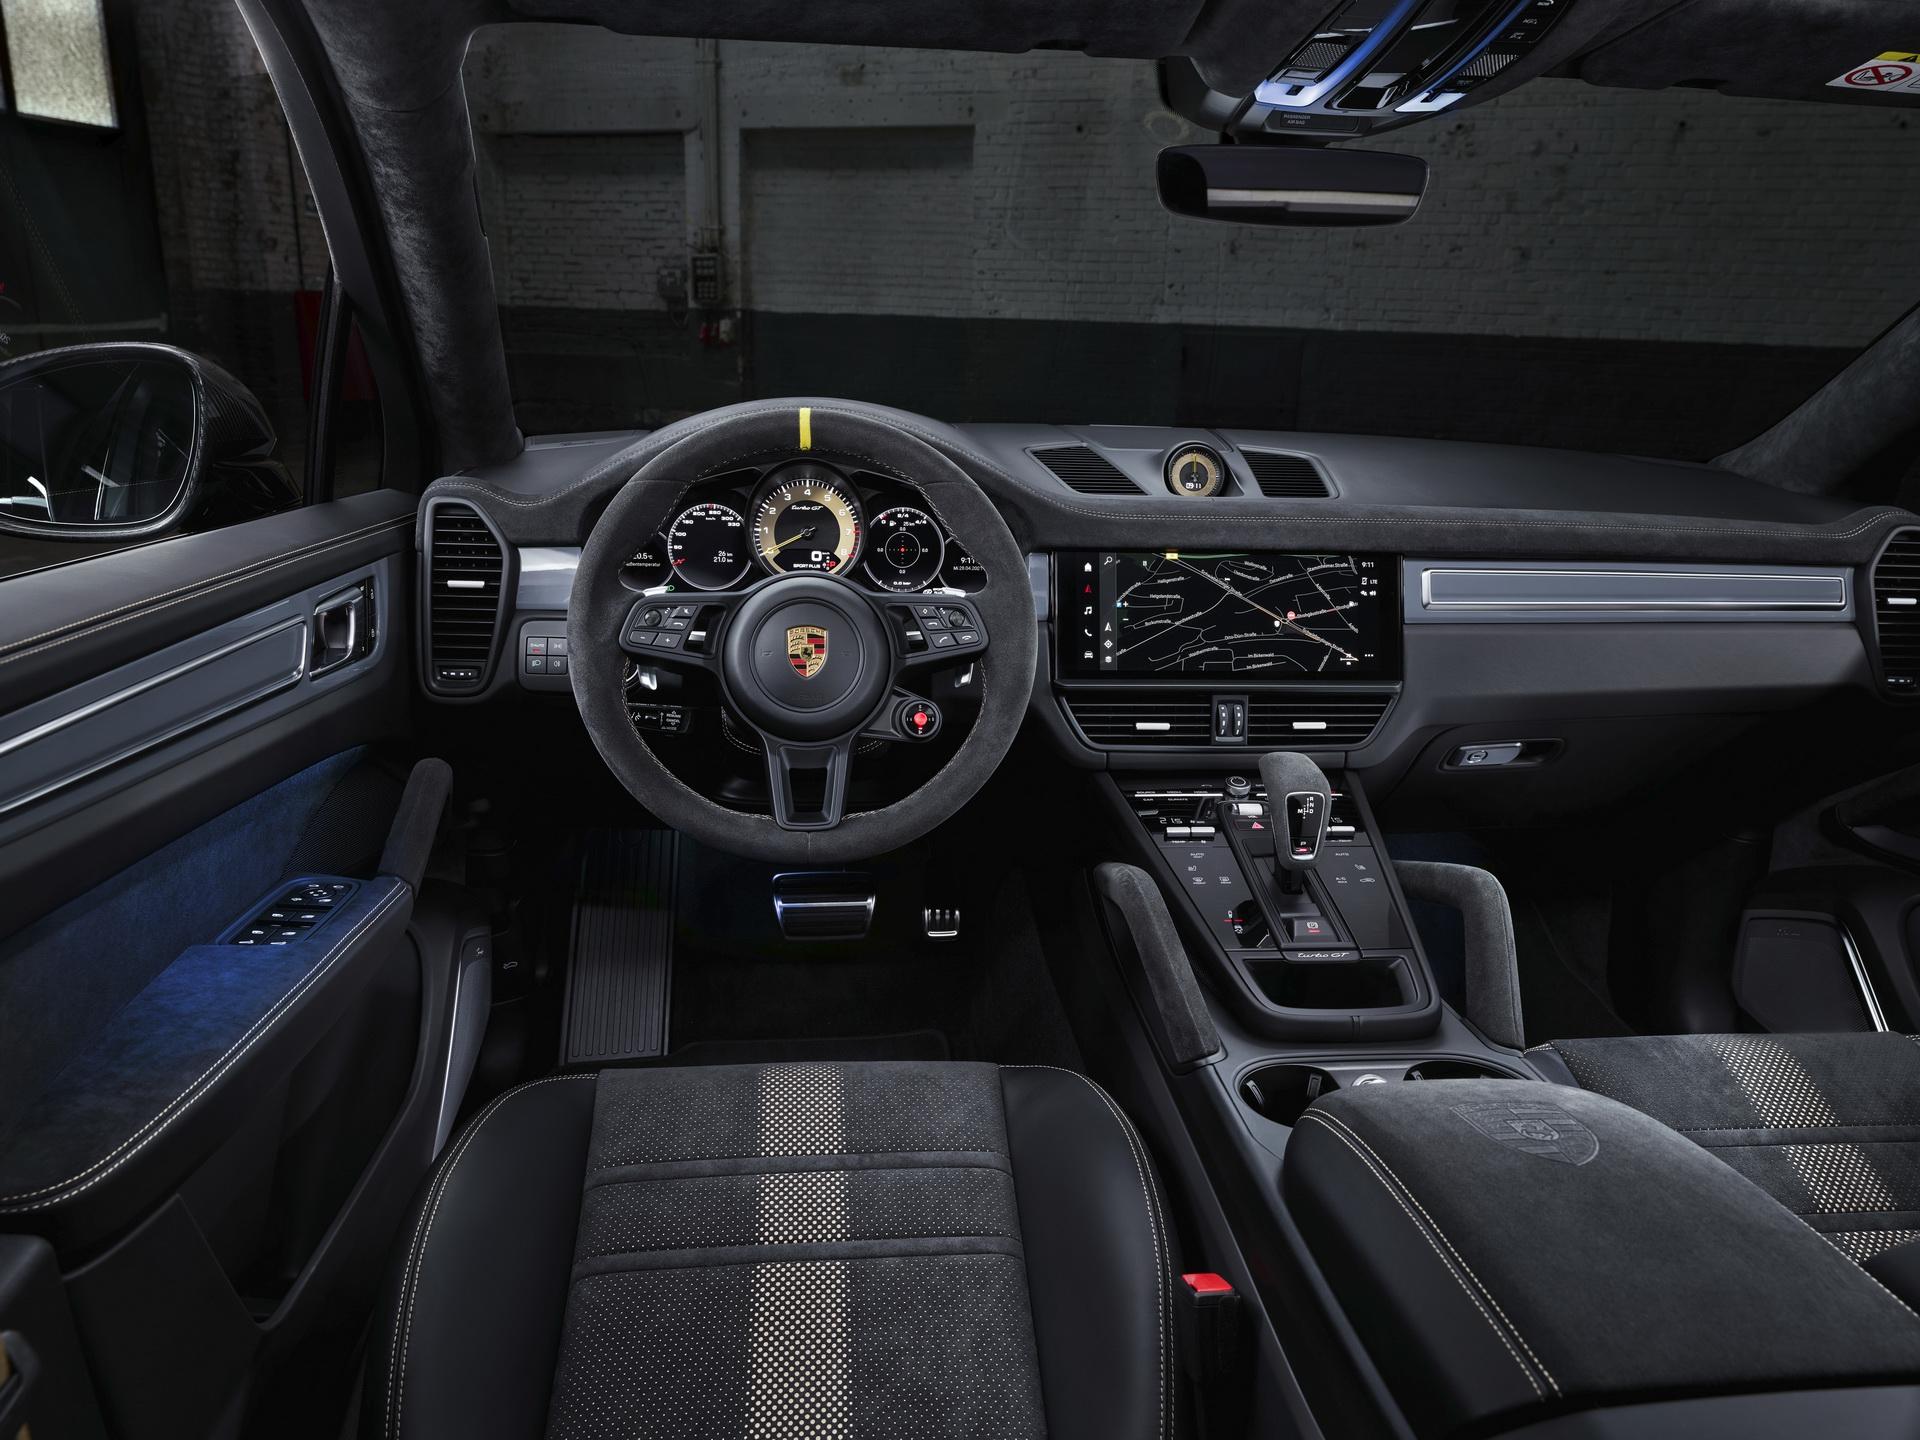 Khoang lái của Porsche Cayenne Turbo GT.